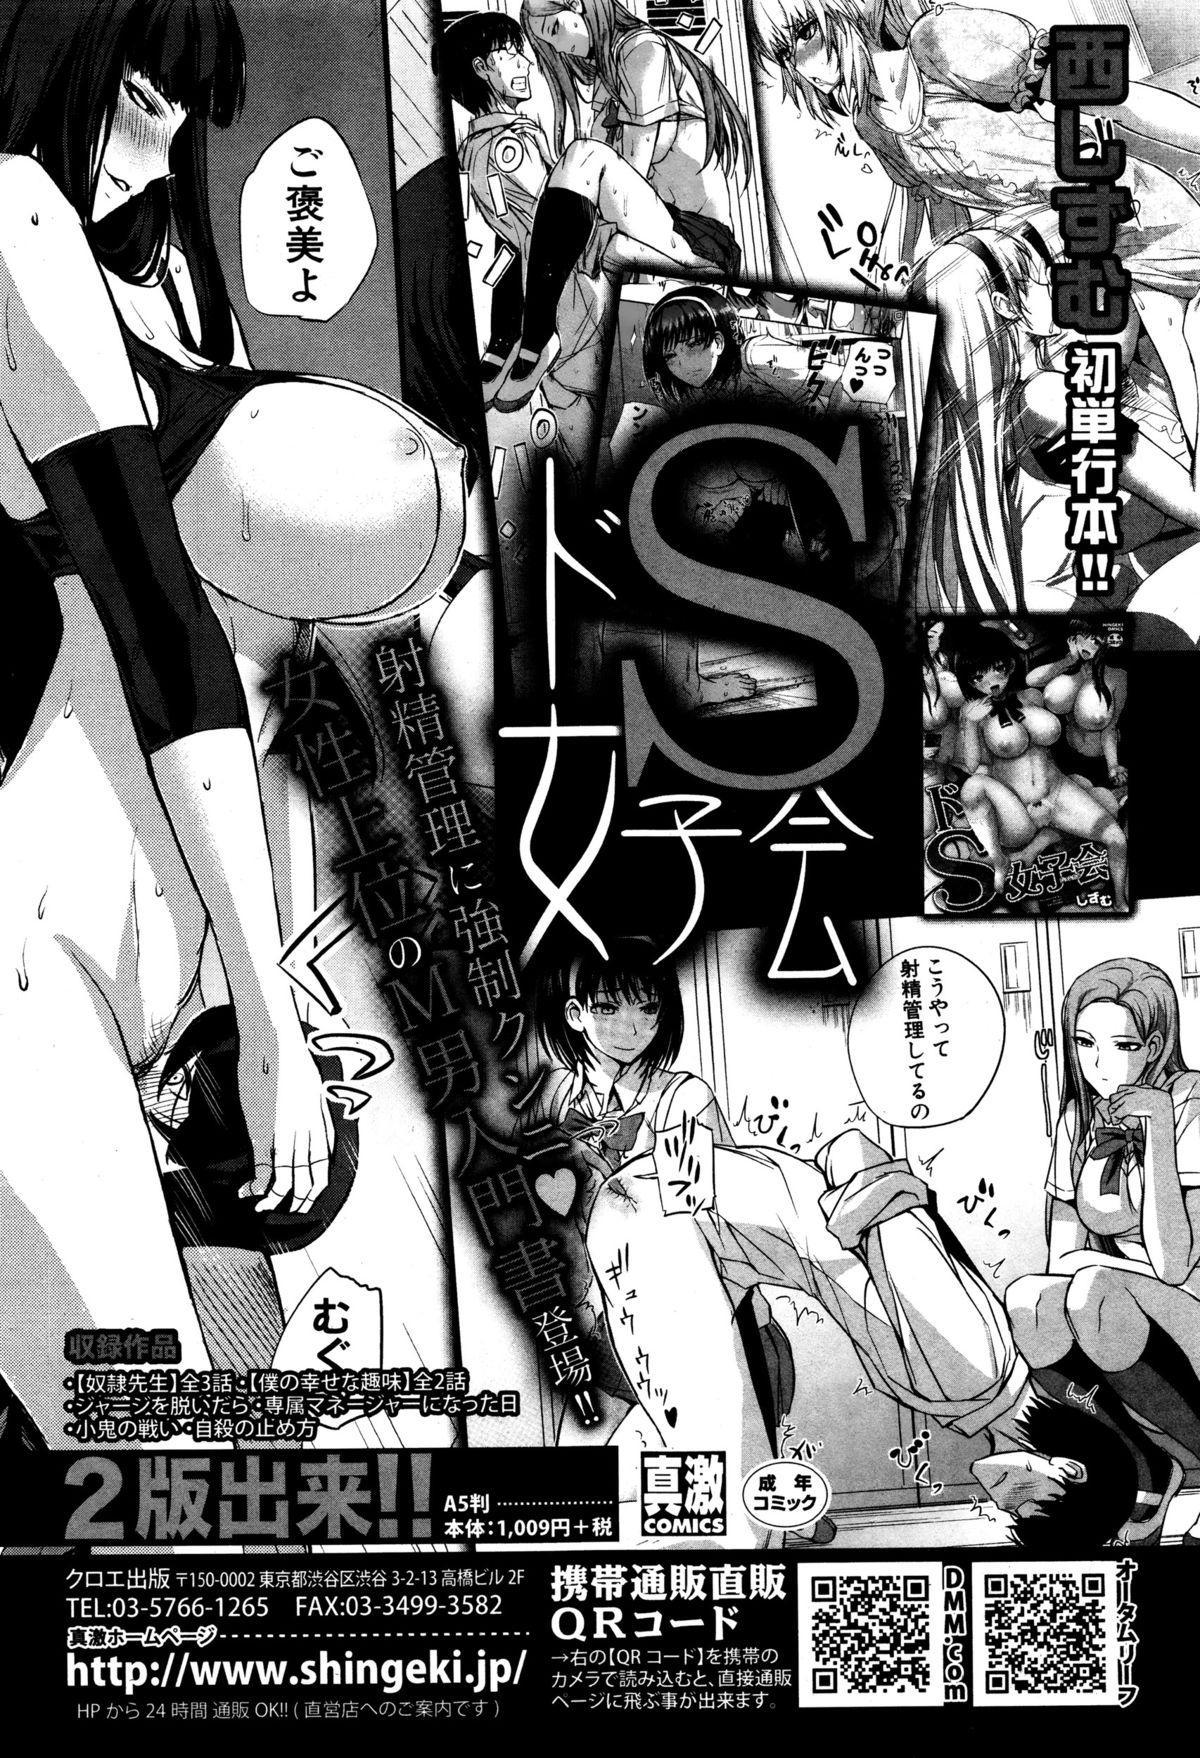 COMIC Shingeki 2016-01 252